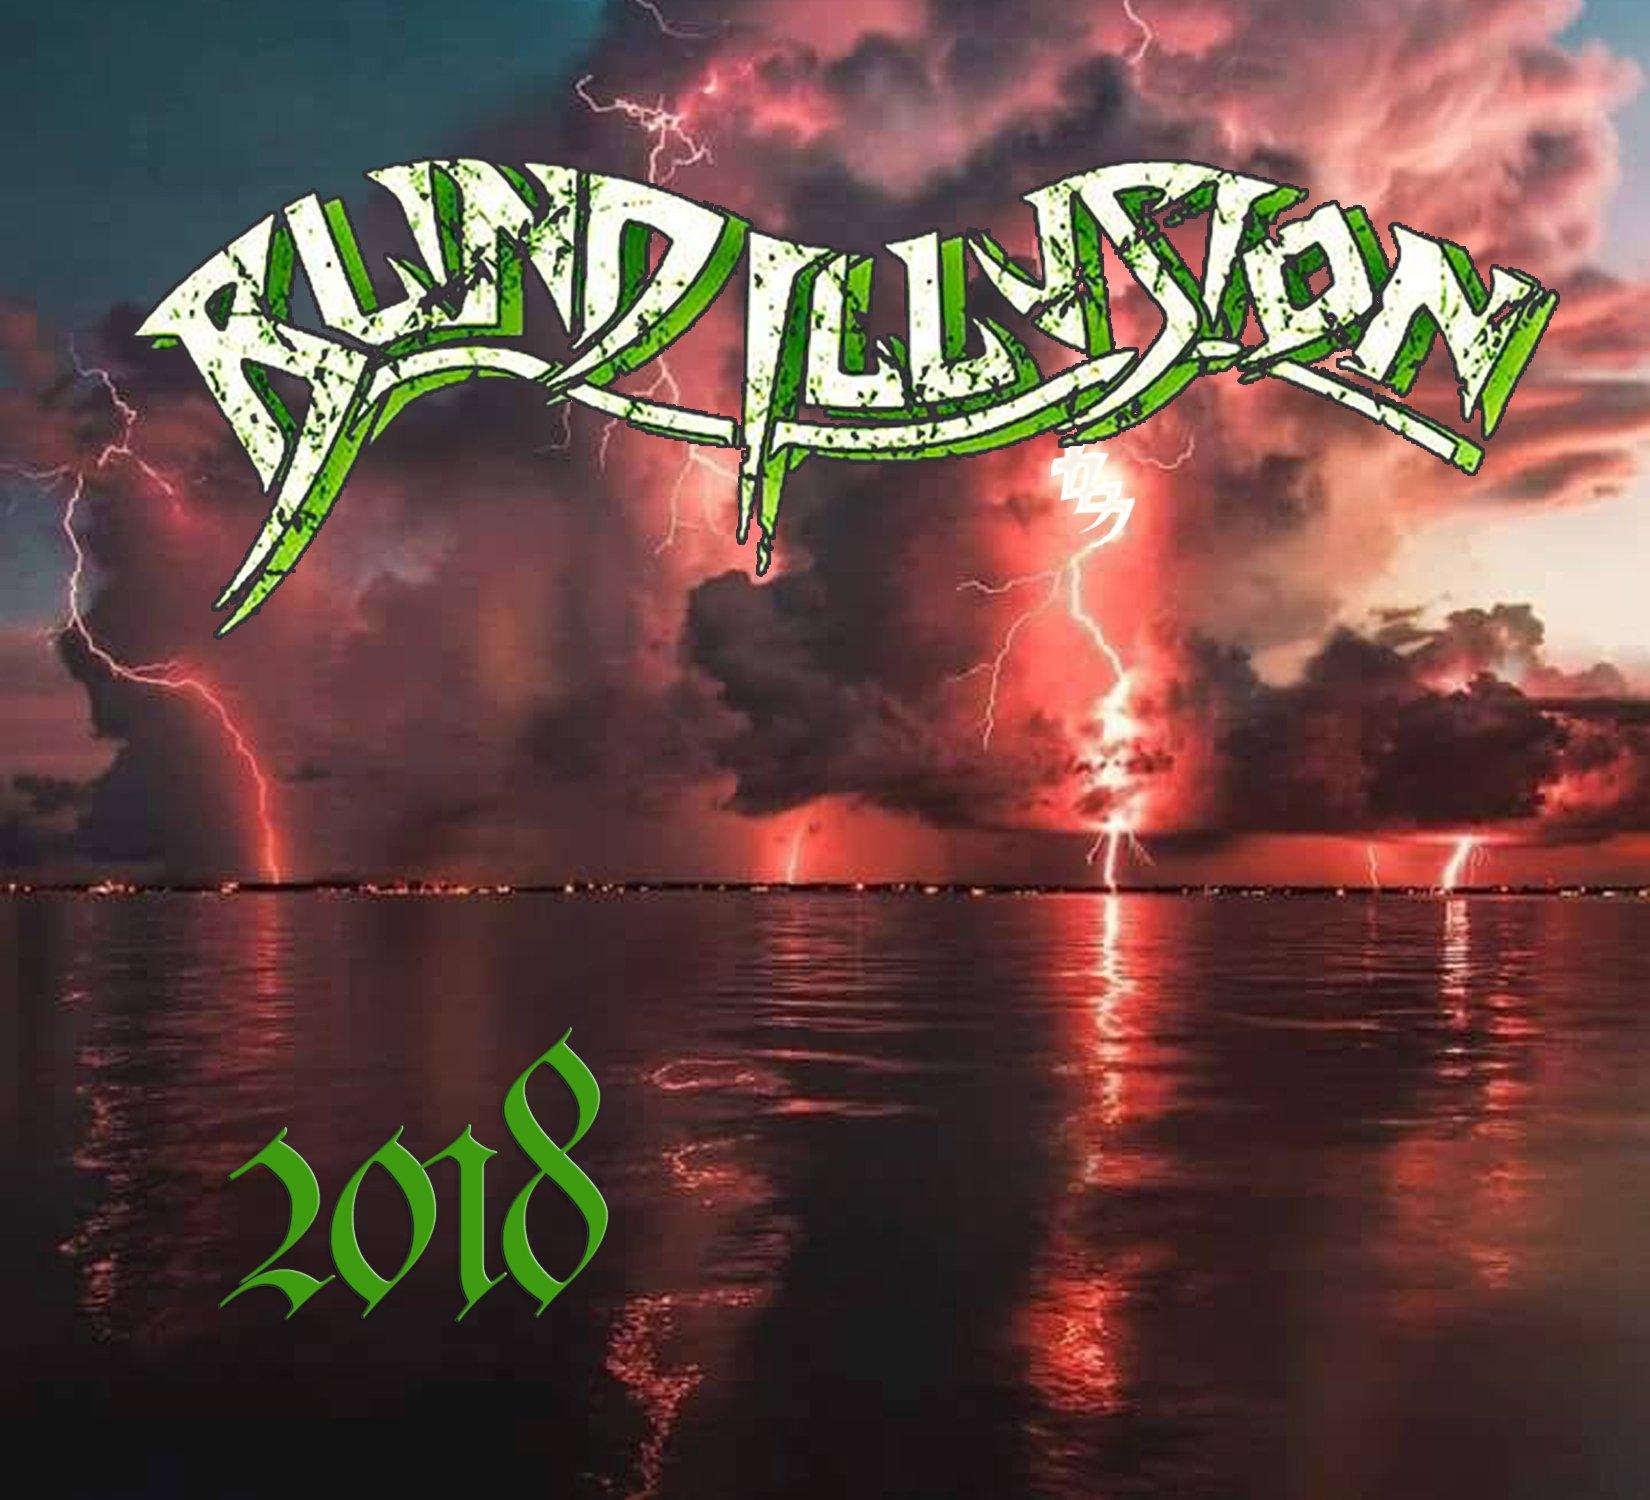 Blind Illusion 2018 EP album cover, lighting striking water